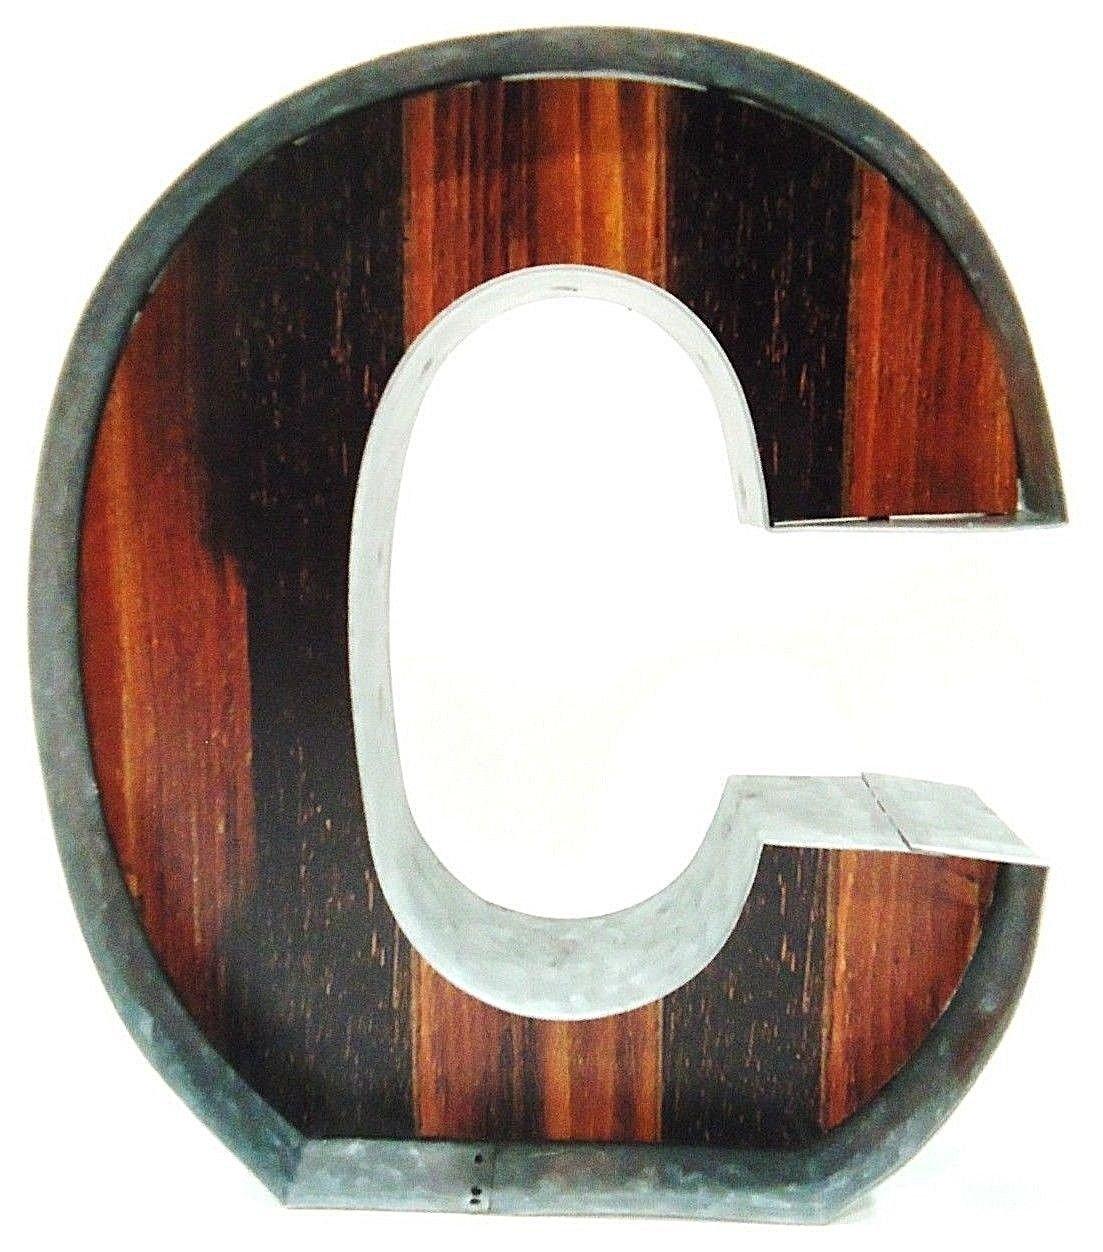 METAL ART - GALVANIZED - STEEL - WOOD - LETTER - C - MODERN - INDUSTRIAL - SIGN